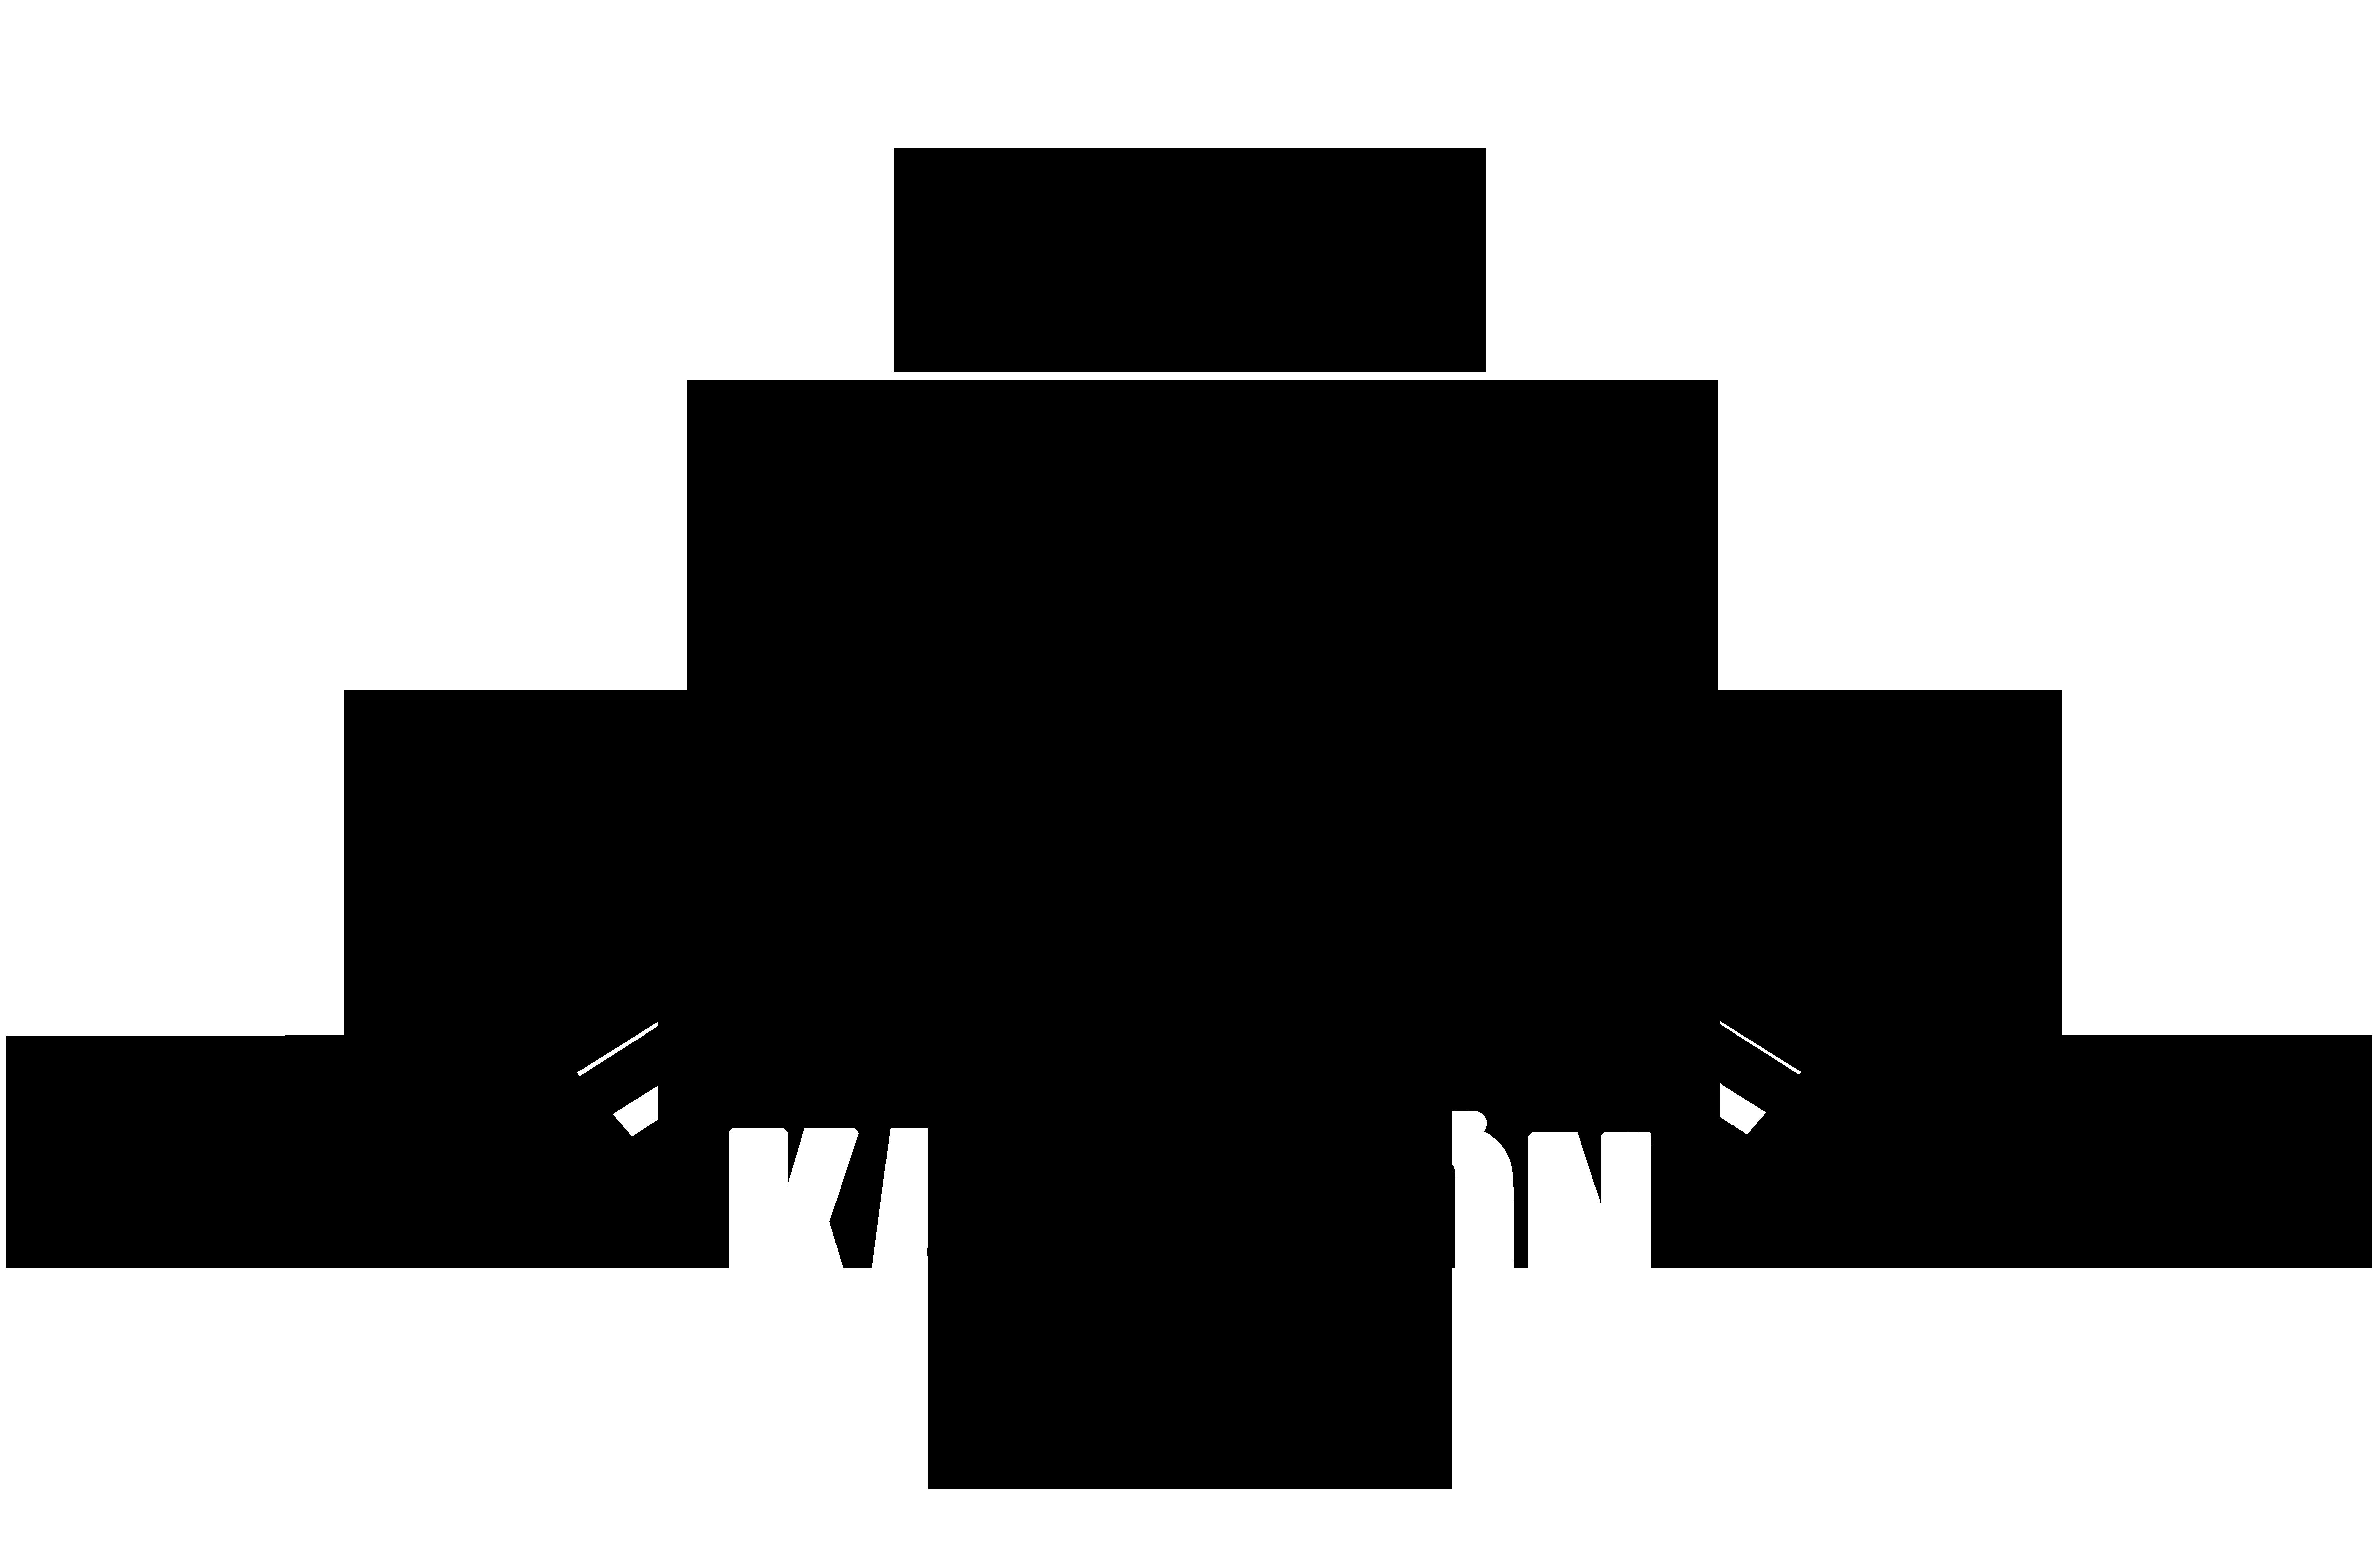 Придумать классный логотип фото f_8675986f0f3d937d.png